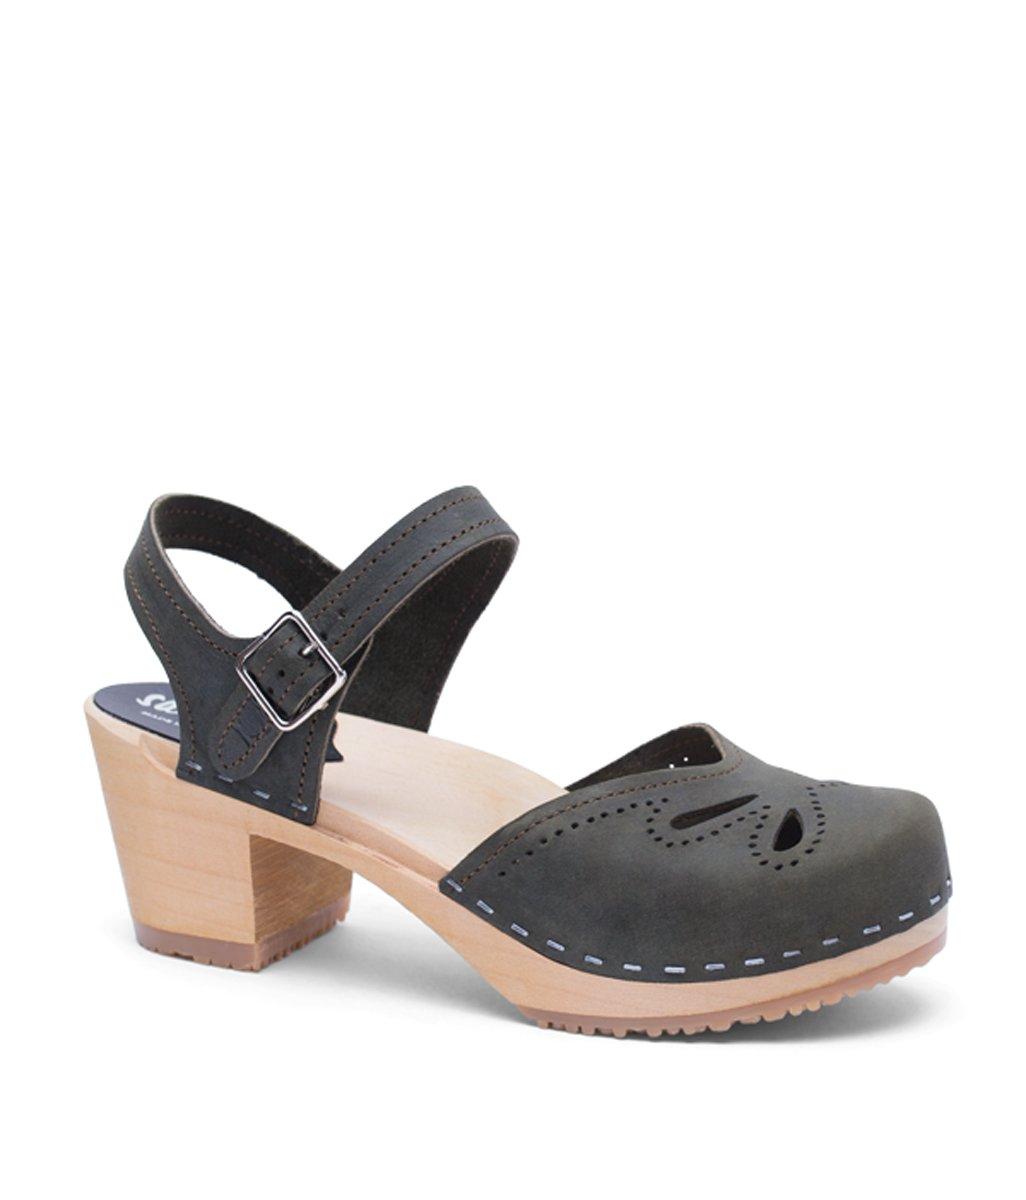 Swedish High Heel Wood Clog Sandals for Women | Copenhagen in Olive by Sandgrens, size US 7 EU 37